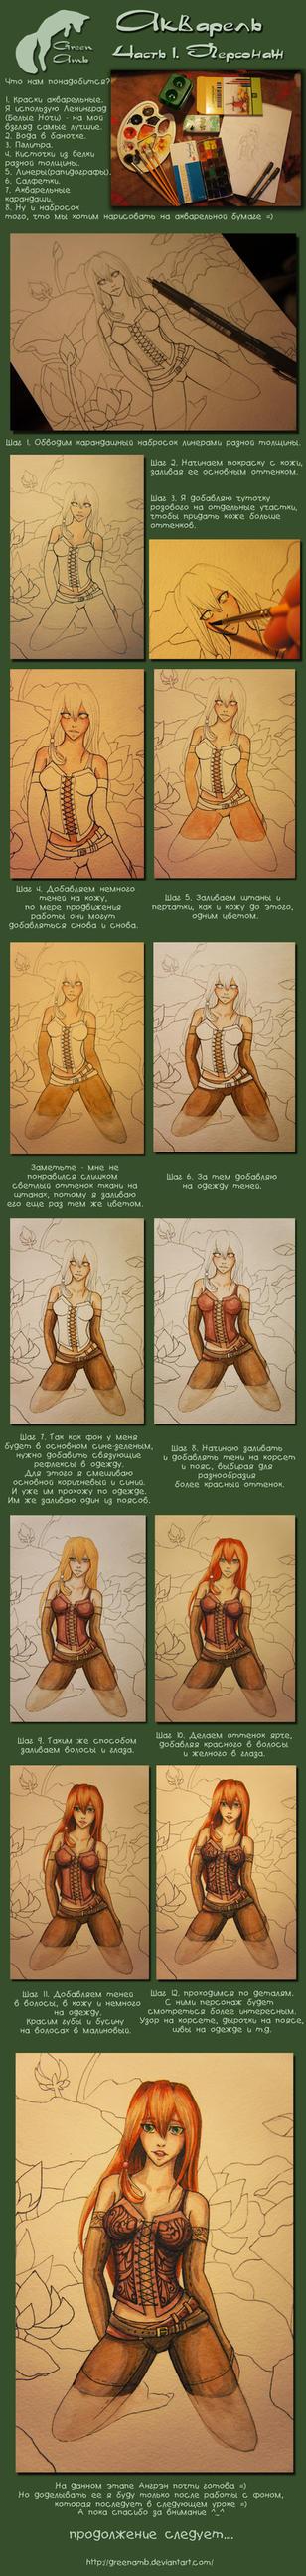 watercolor.tutorial. part 1 by GreenAmb